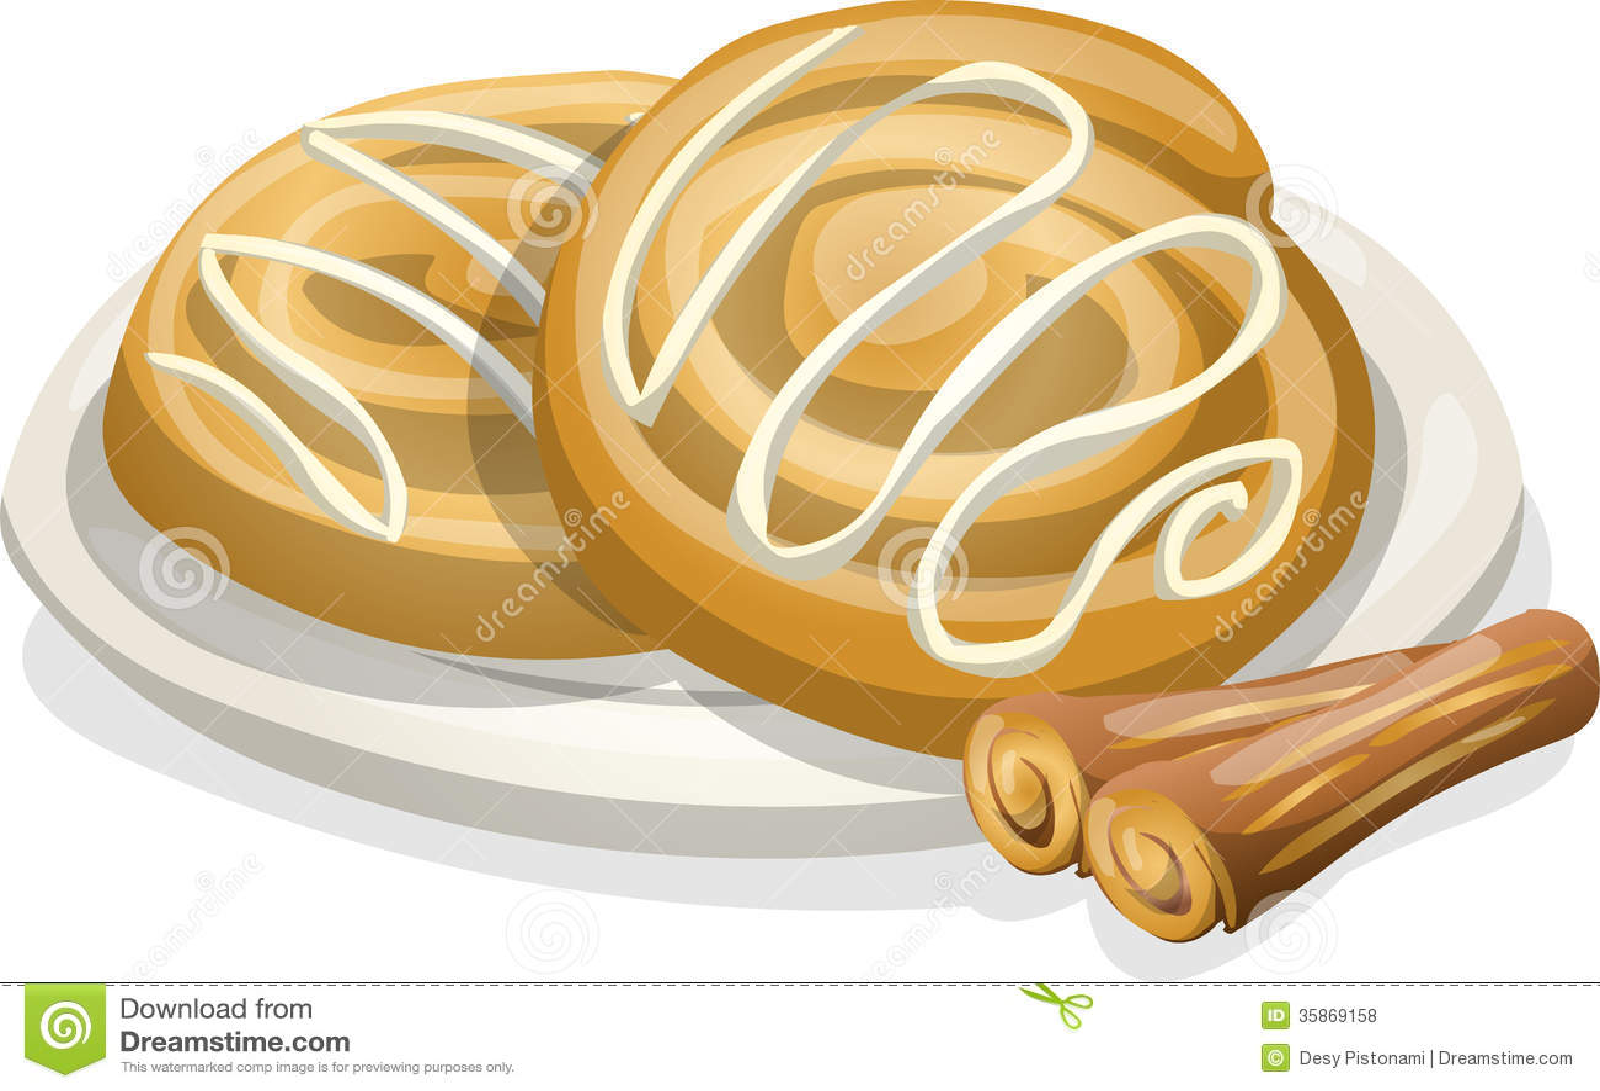 Cinnamon roll art   Etsy